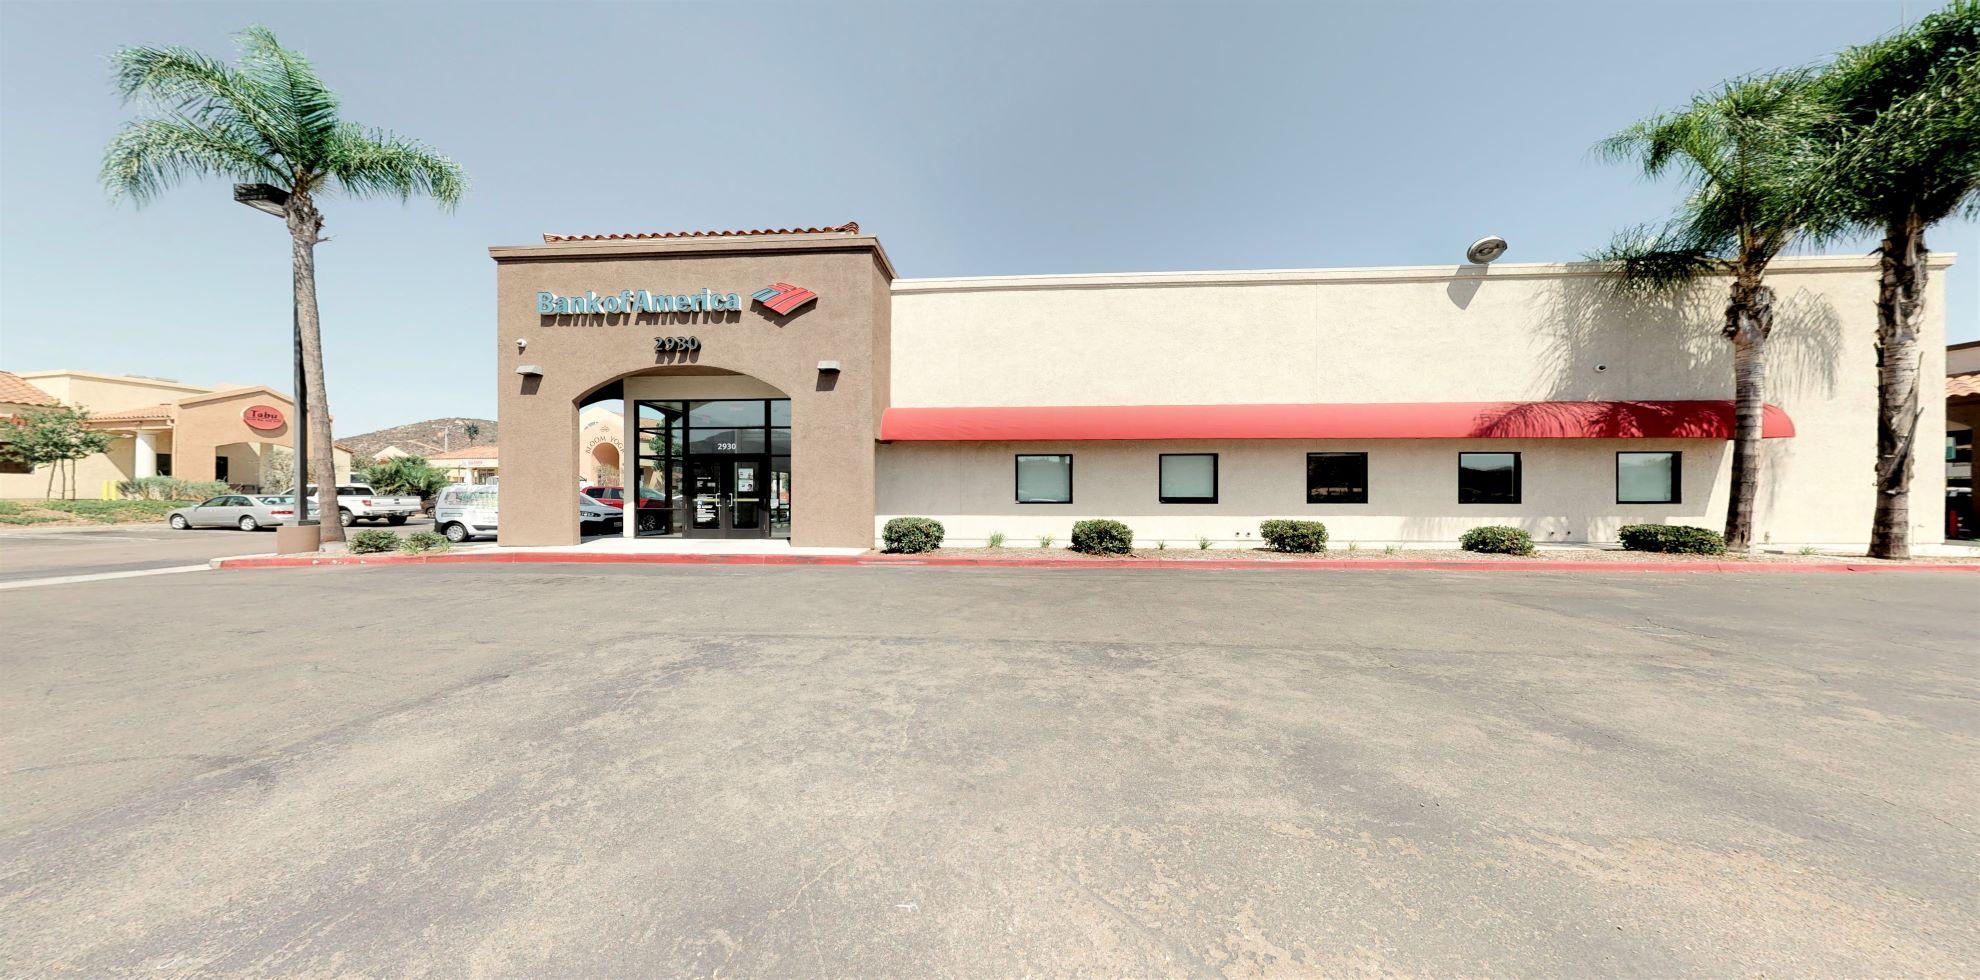 Bank of America financial center with walk-up ATM | 2930 Jamacha Rd, El Cajon, CA 92019